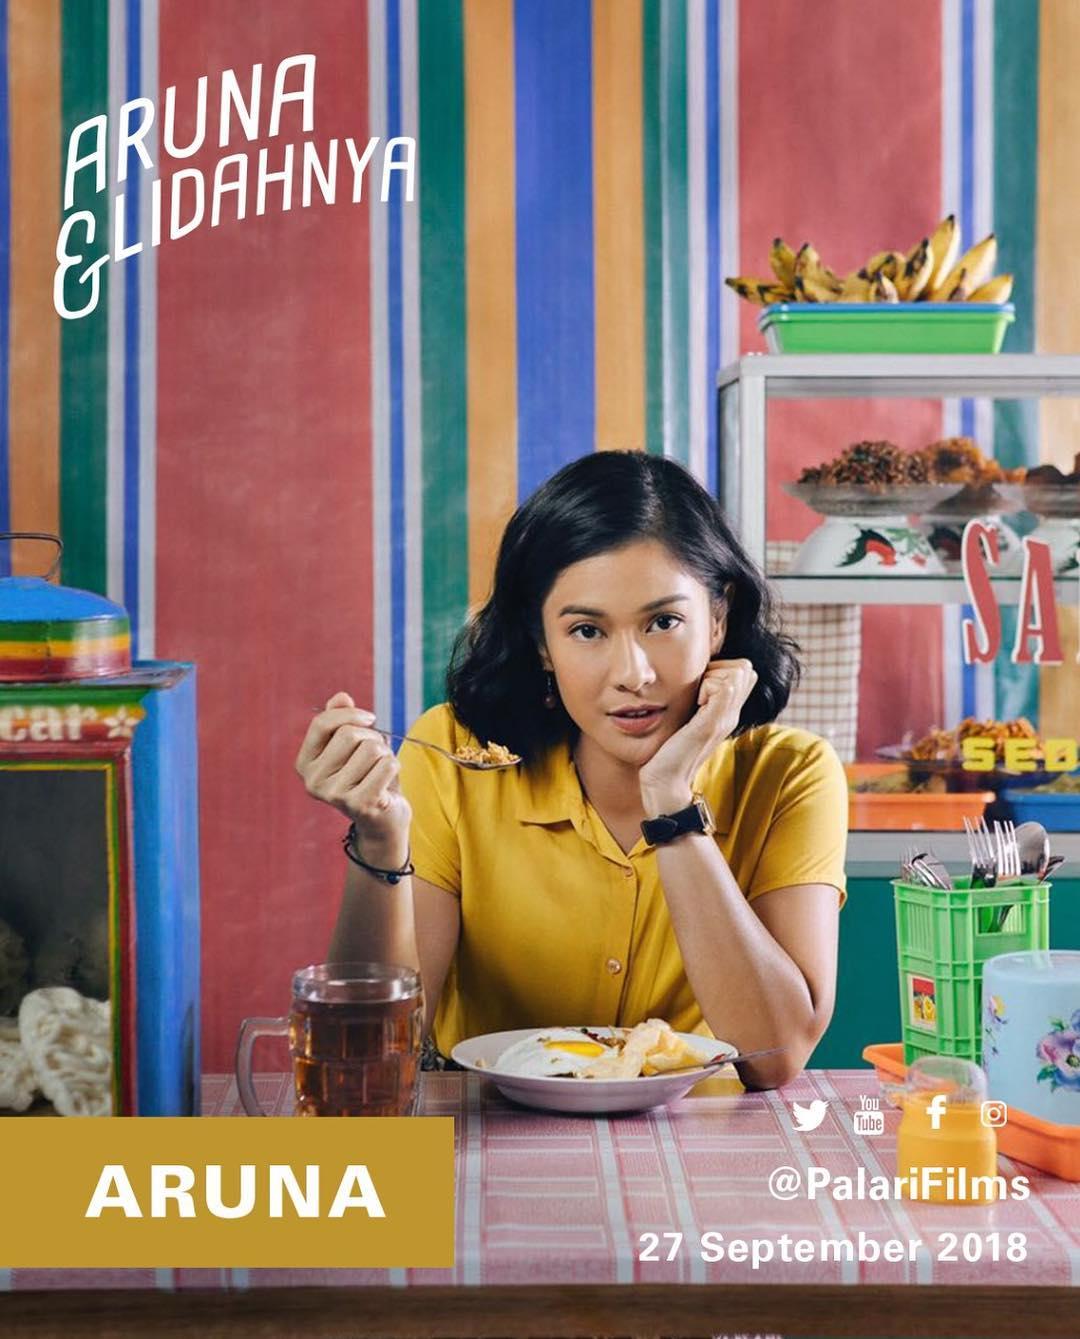 Cover Aruna dan Lidahnya